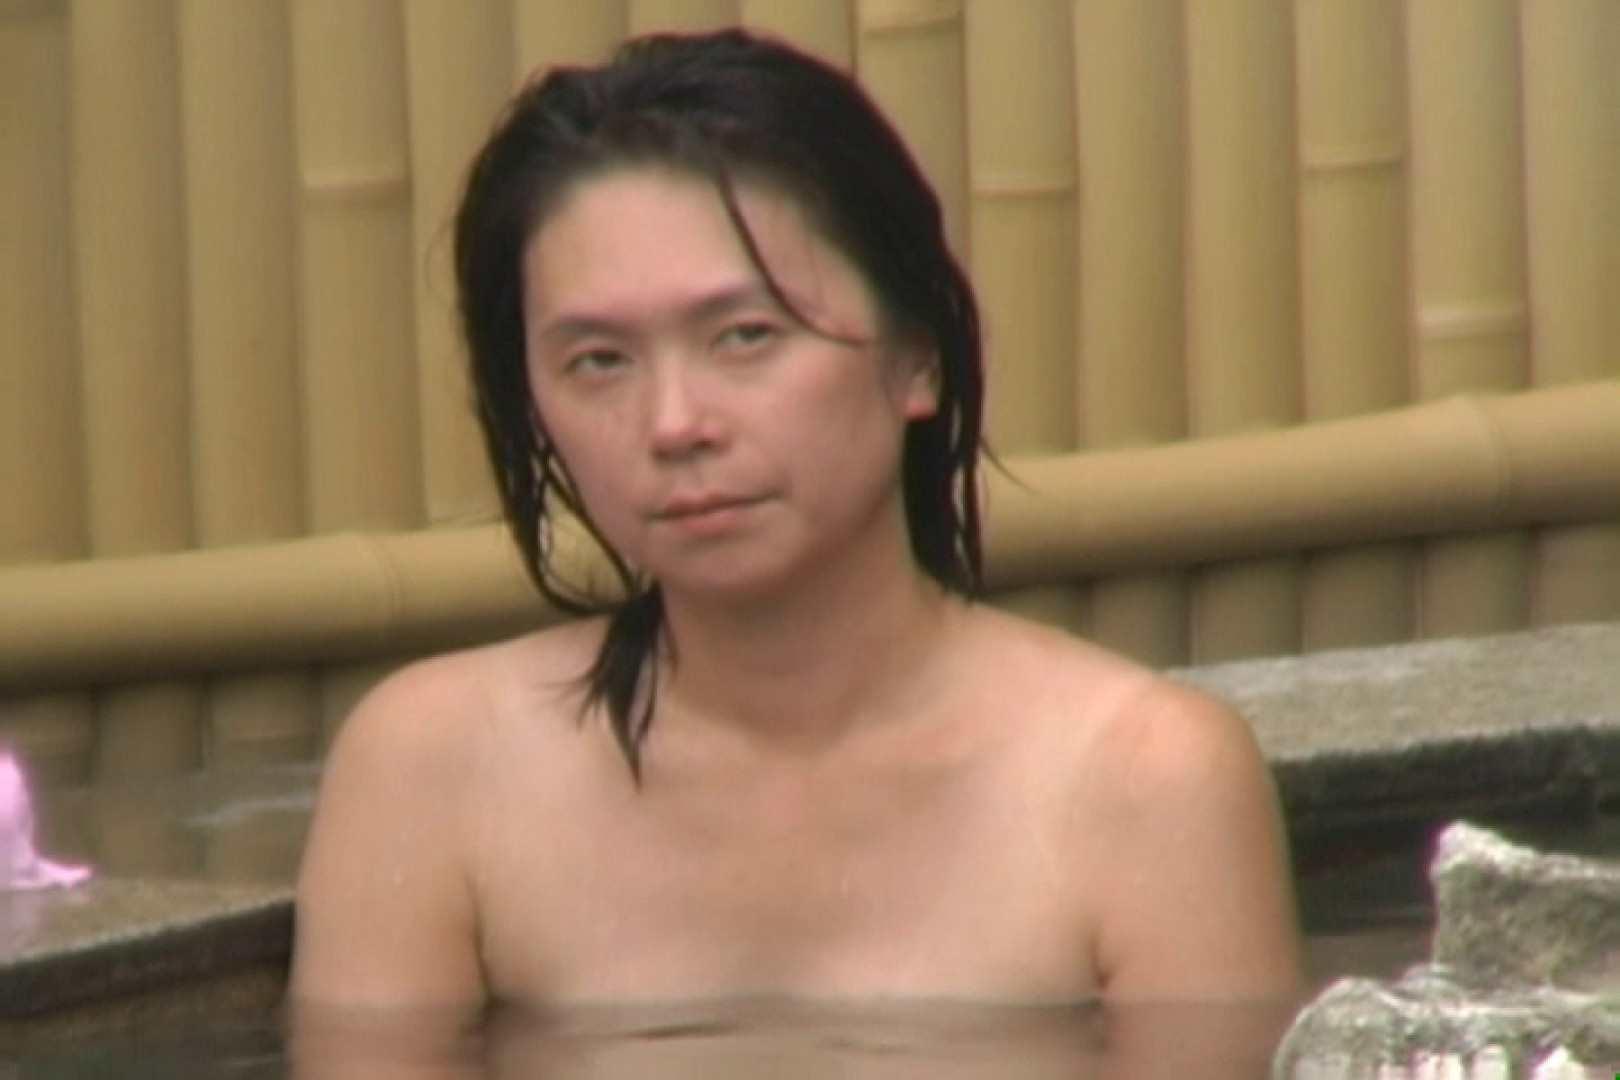 Aquaな露天風呂Vol.619 エッチな盗撮 ワレメ無修正動画無料 107pic 43